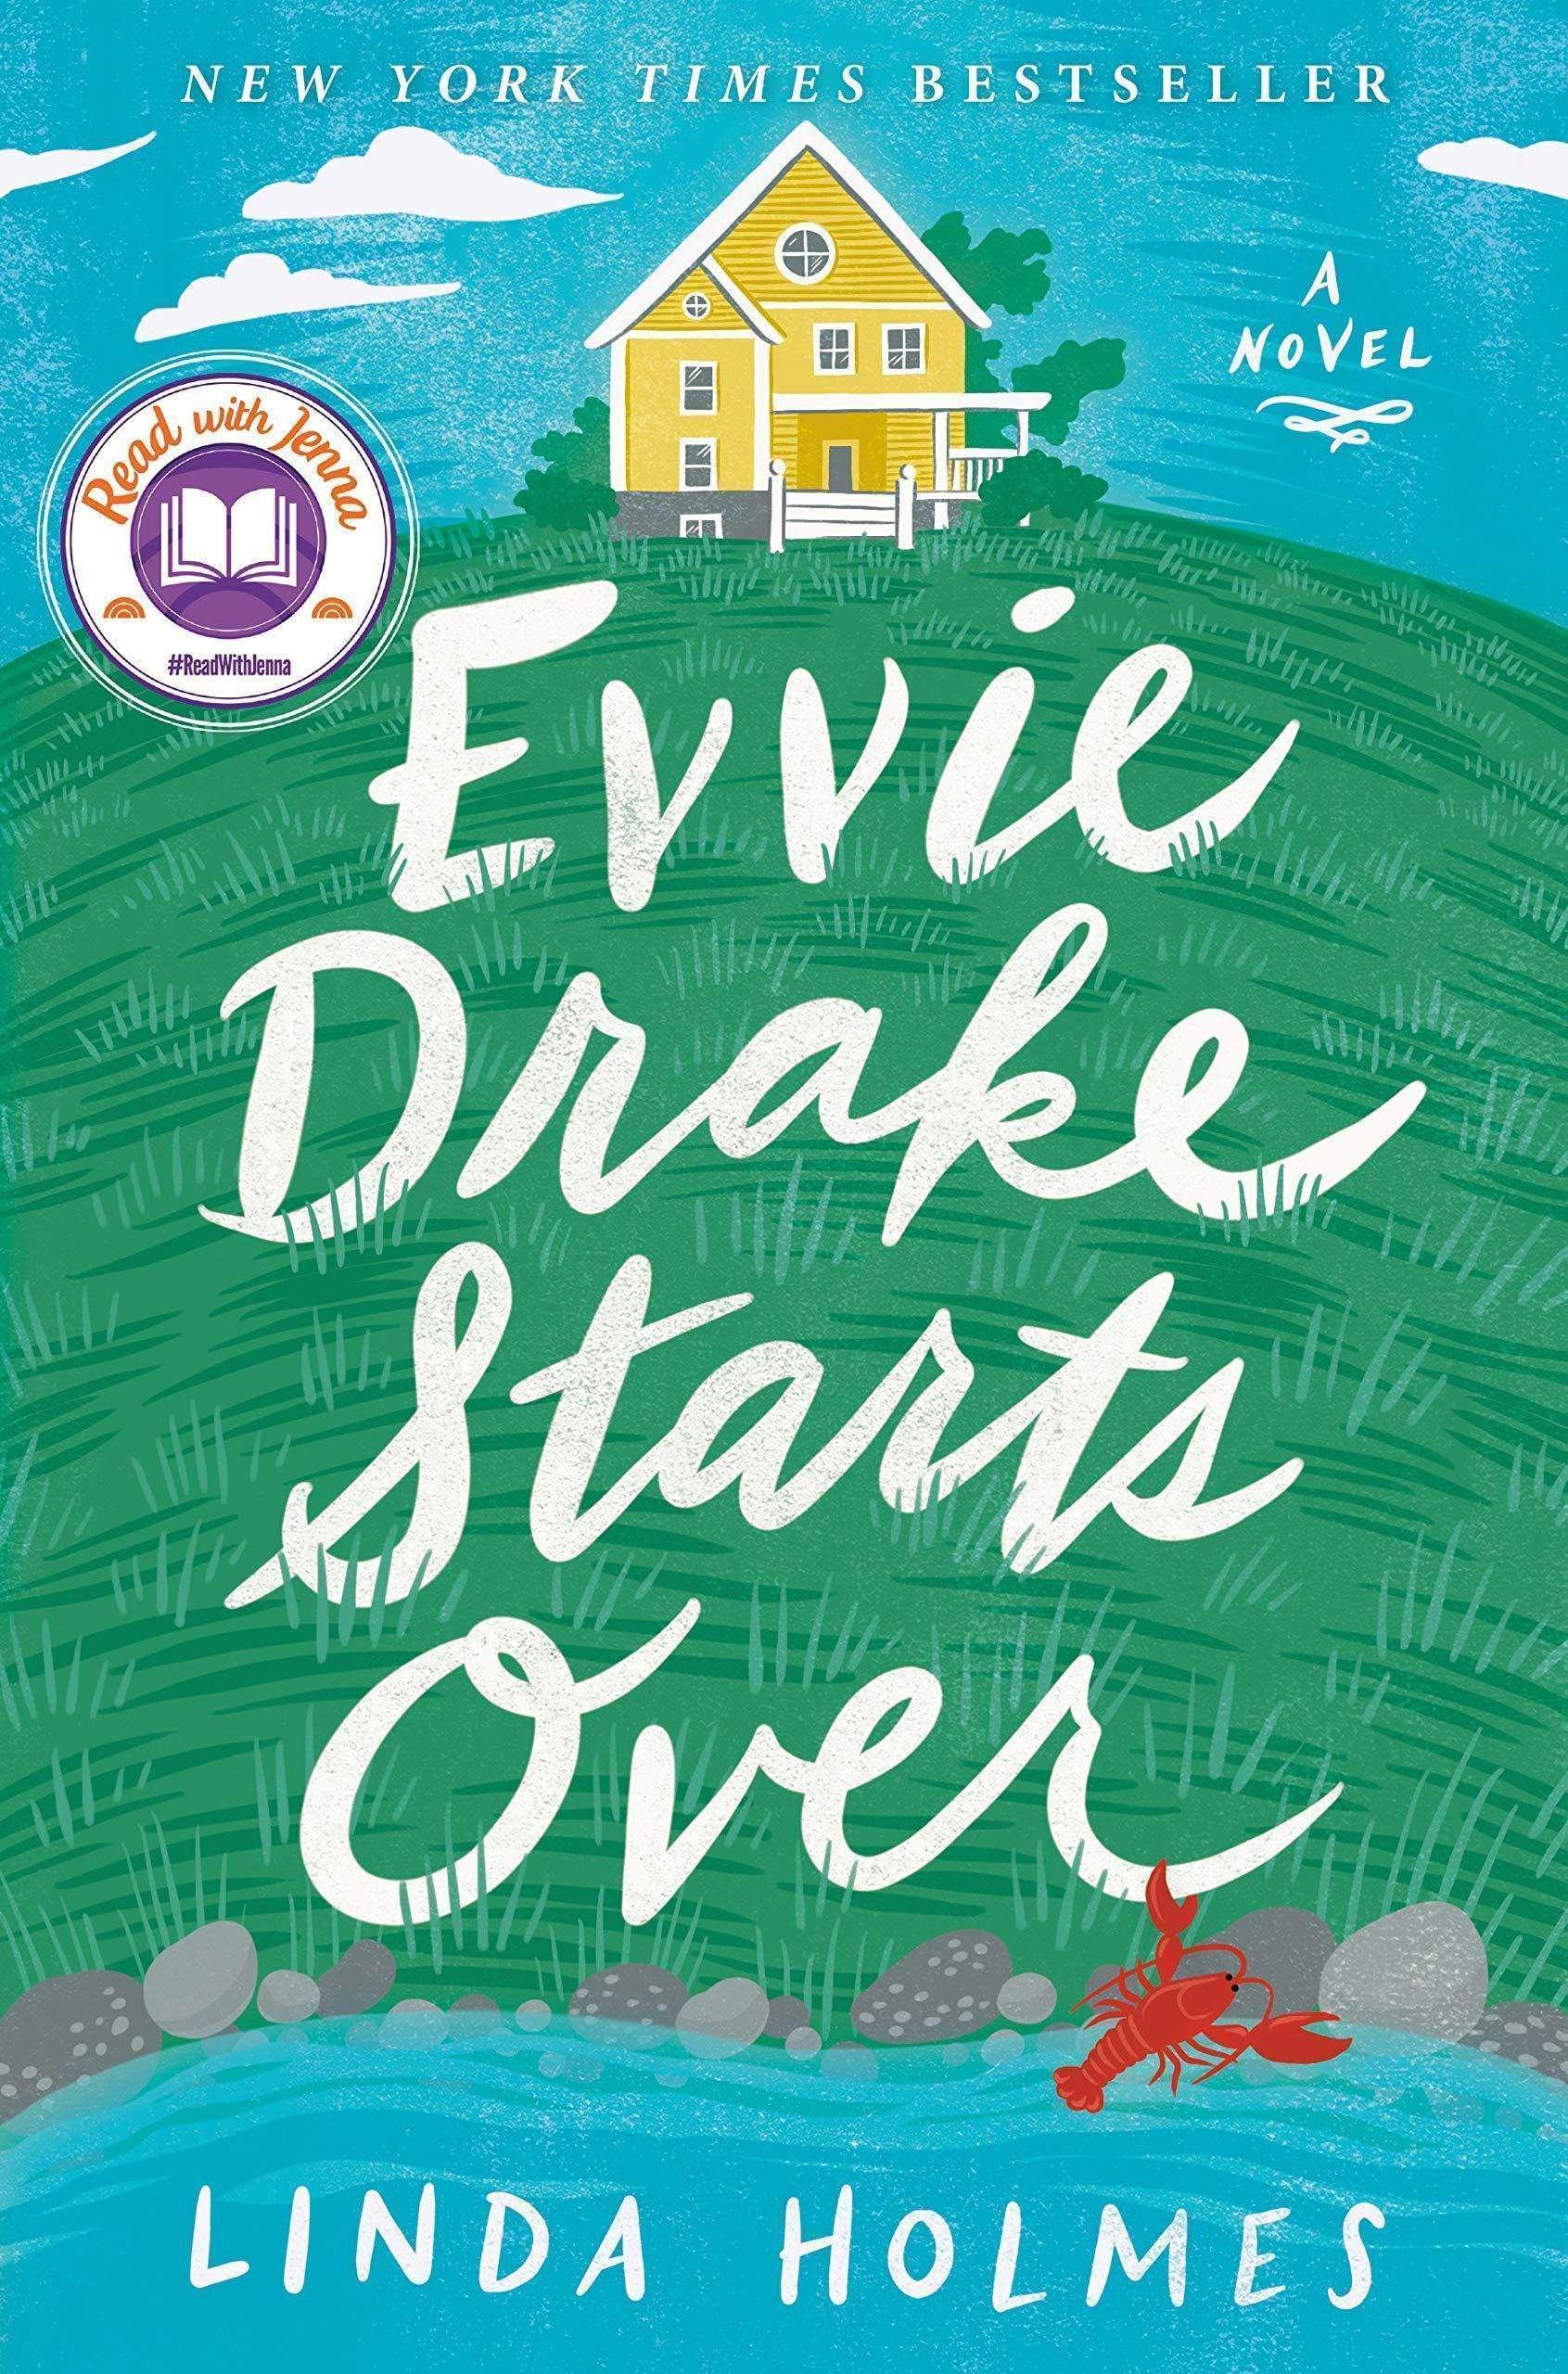 Books I Read in December 2019: Evvie Drake Starts Over by Linda Holmes